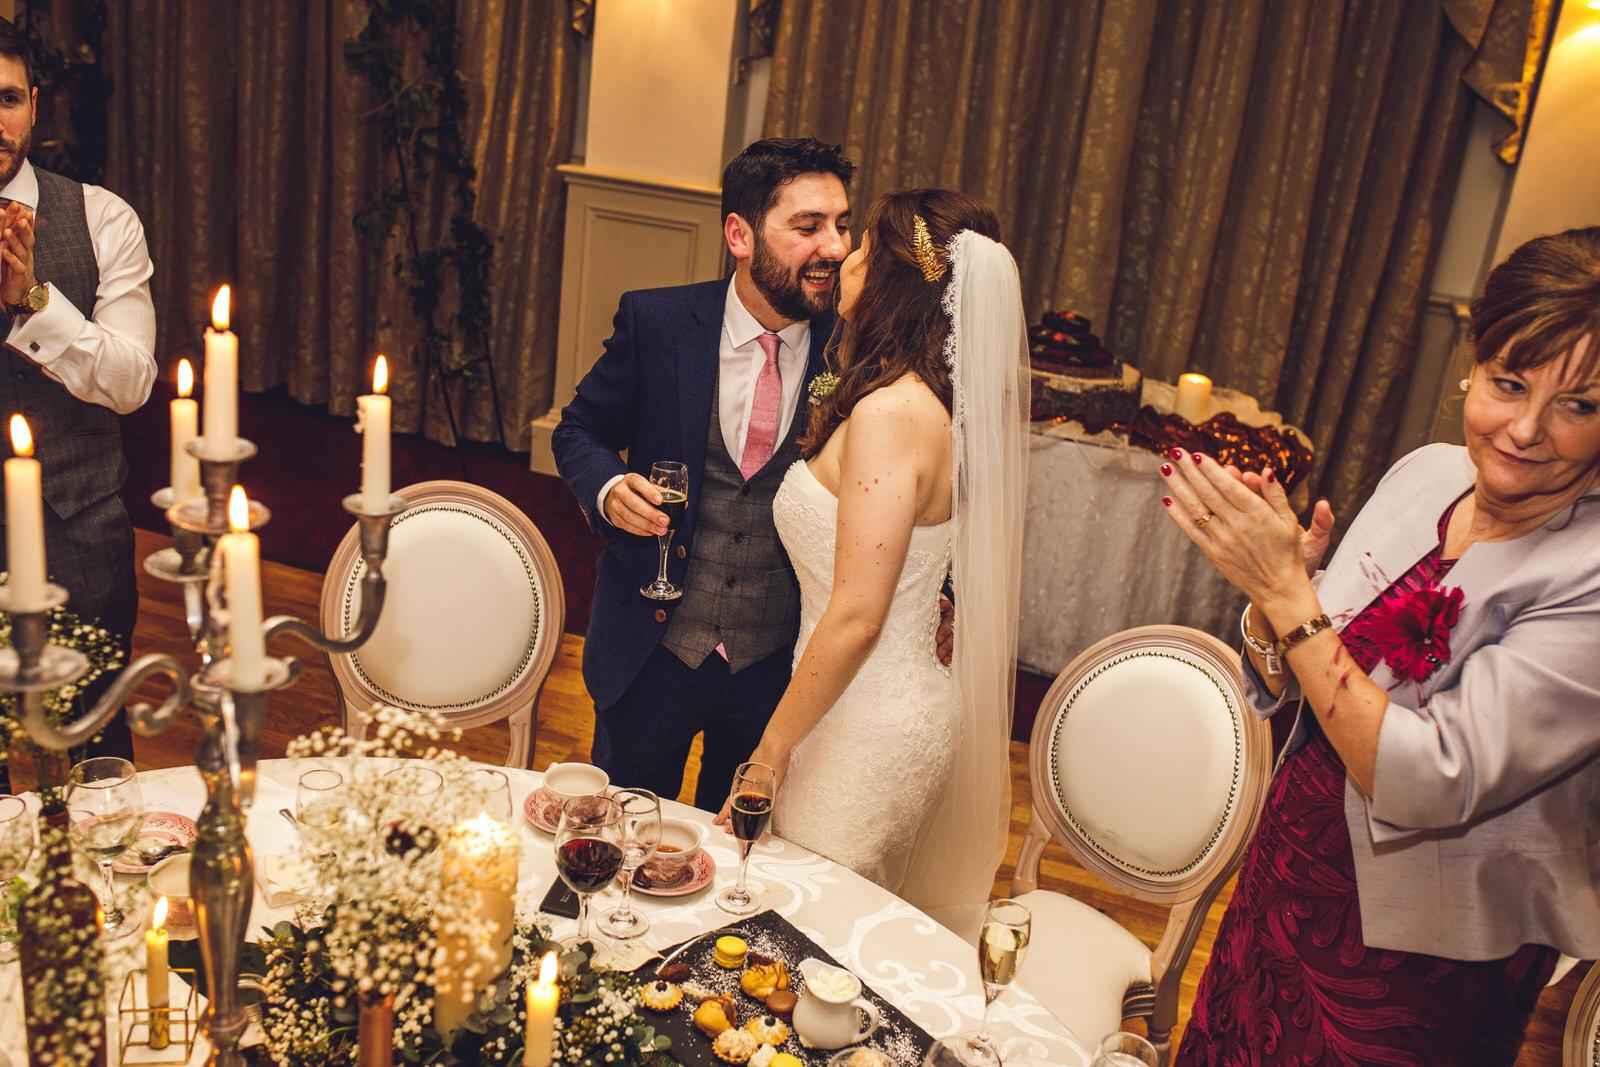 Roger-kenny-wedding-photographer-greystones-wicklow-dublin_119.jpg